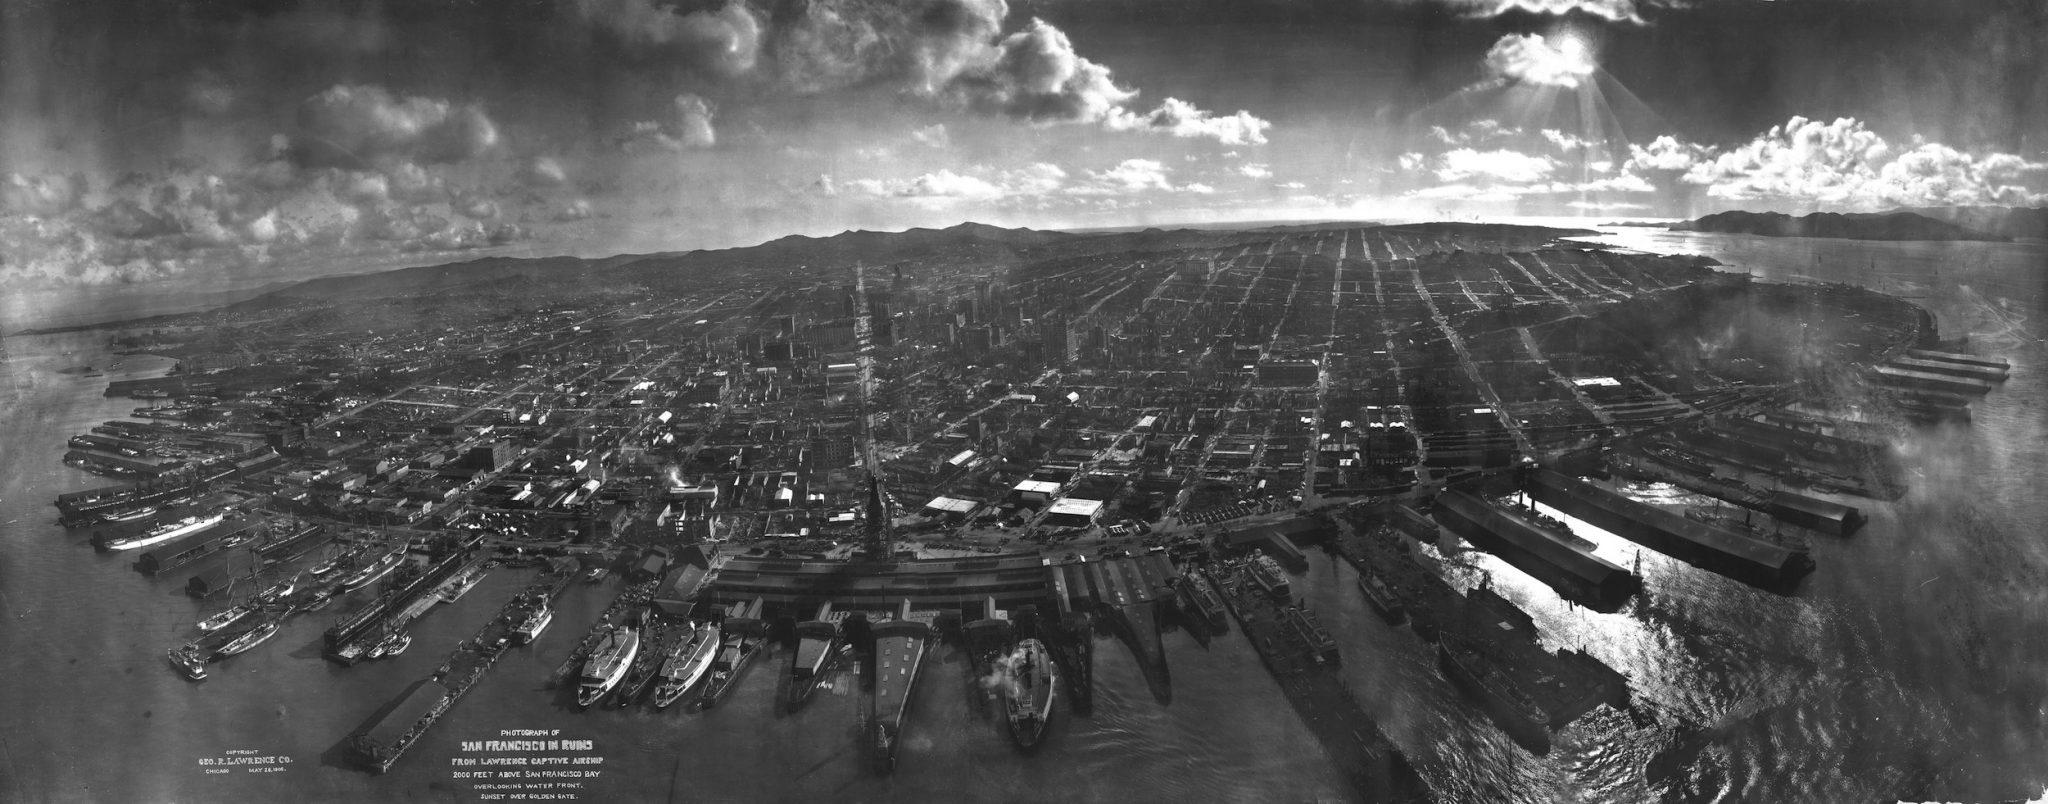 San_Francisco_in_ruins_from_Lawrence_Captive_Airship_1906